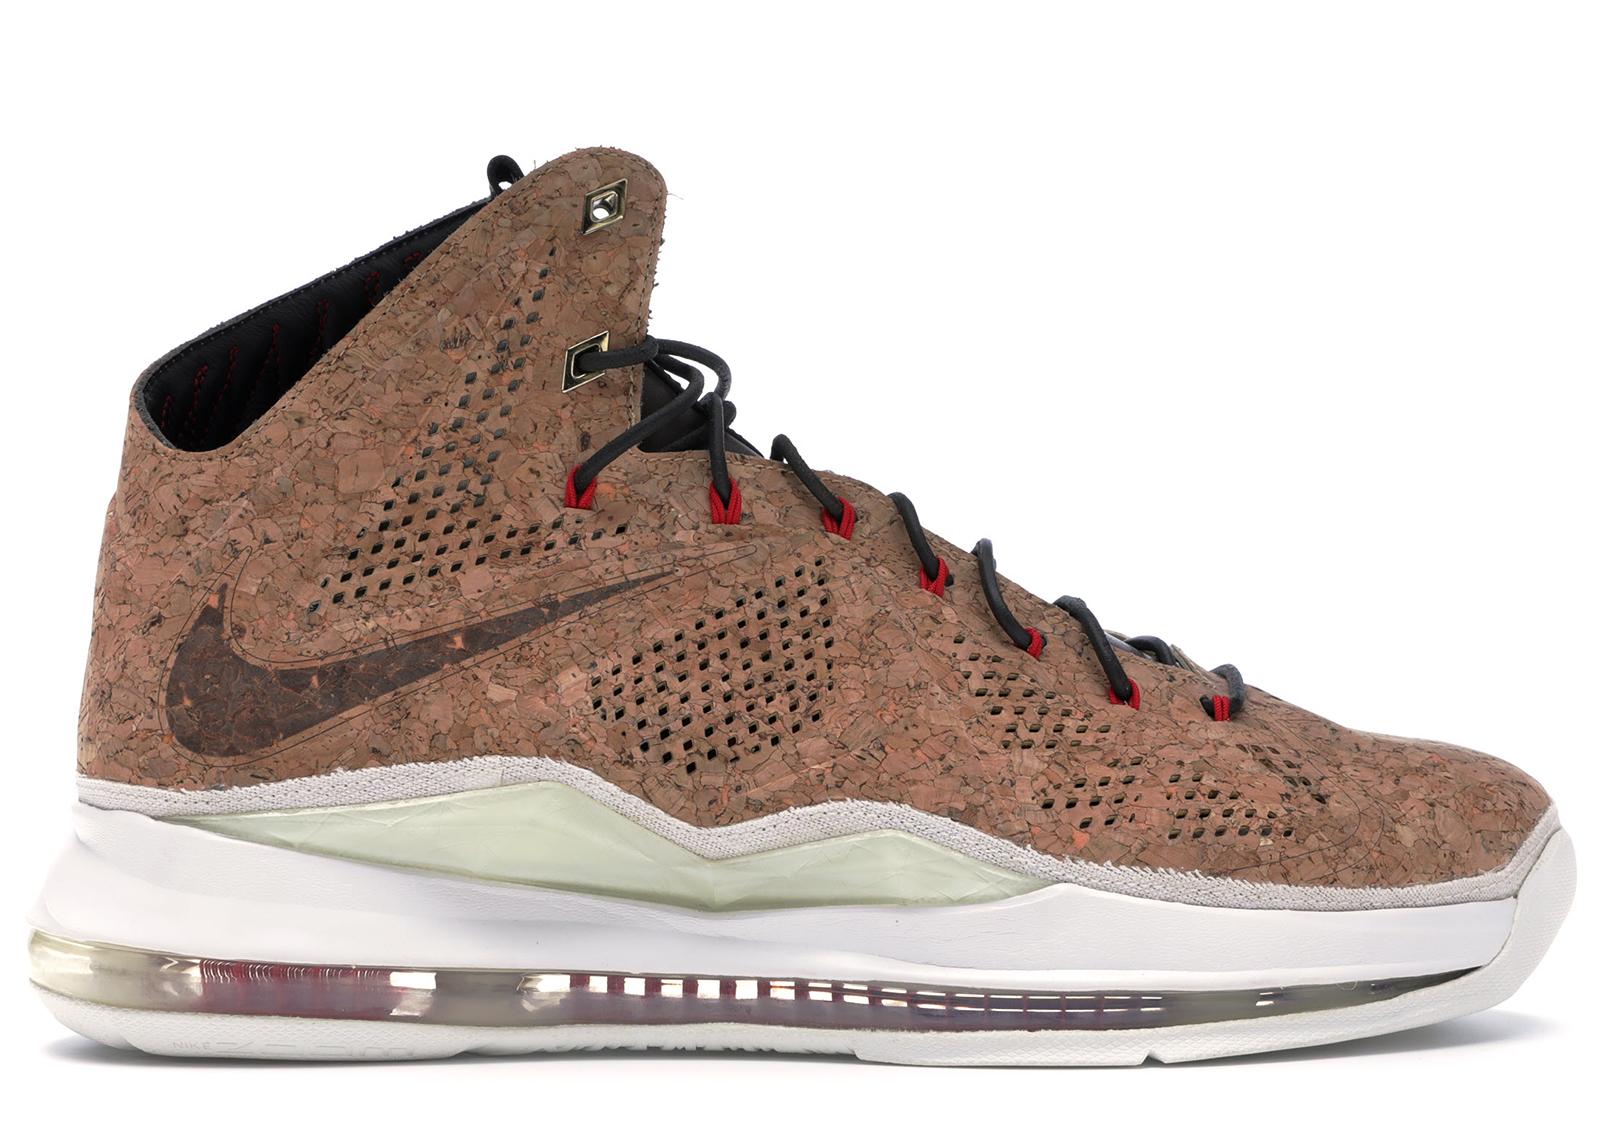 Nike LeBron X EXT Cork - 580890-200